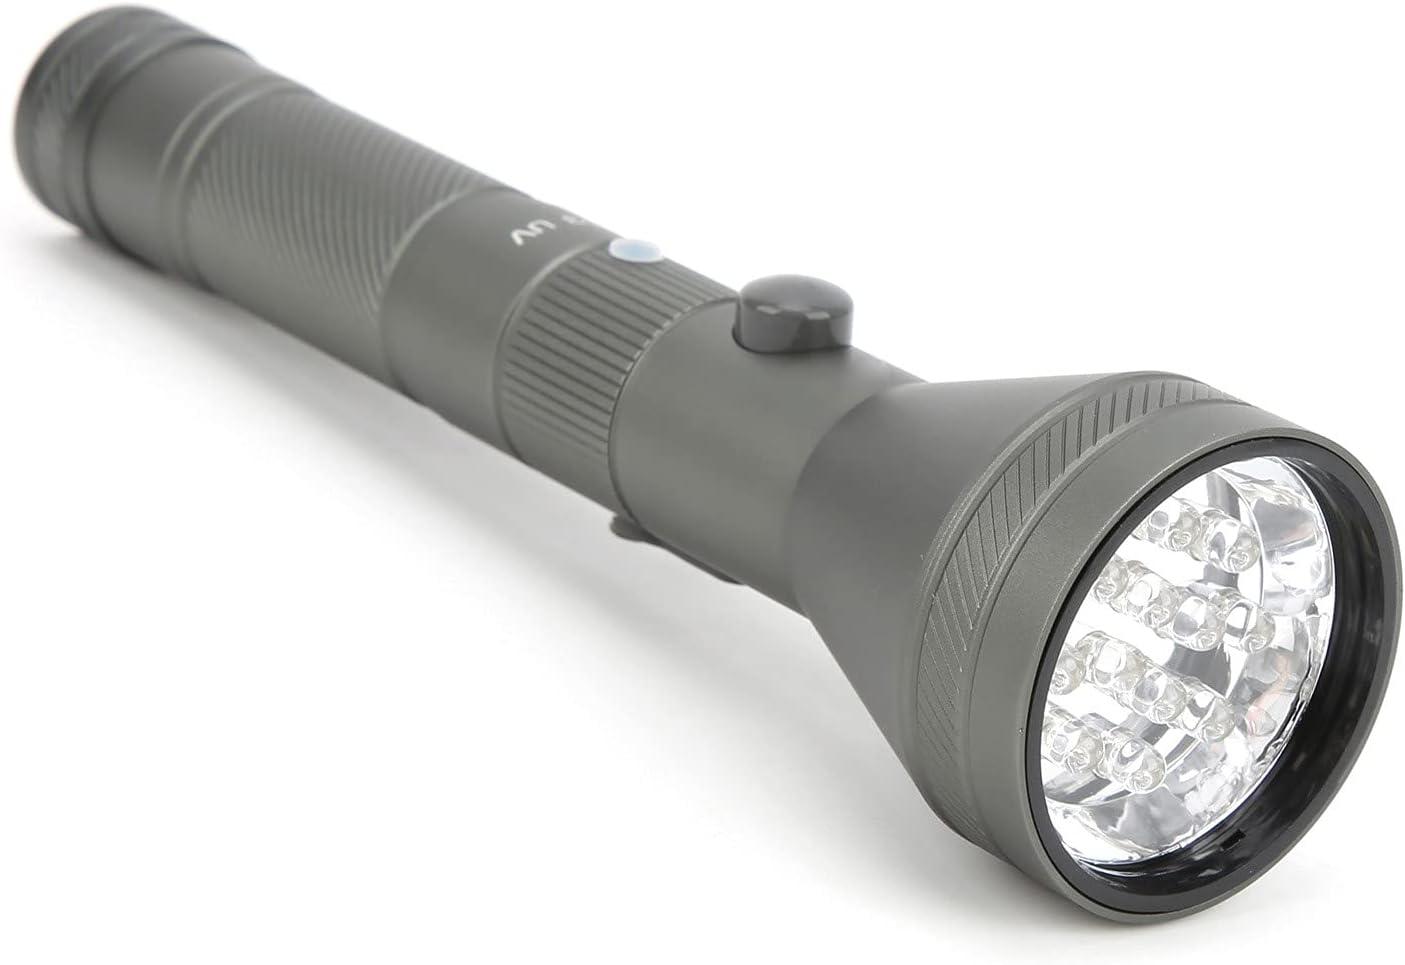 Deevay UV Flashlight Waterproof USB Rechargeable Detector for De Tulsa Mall mart